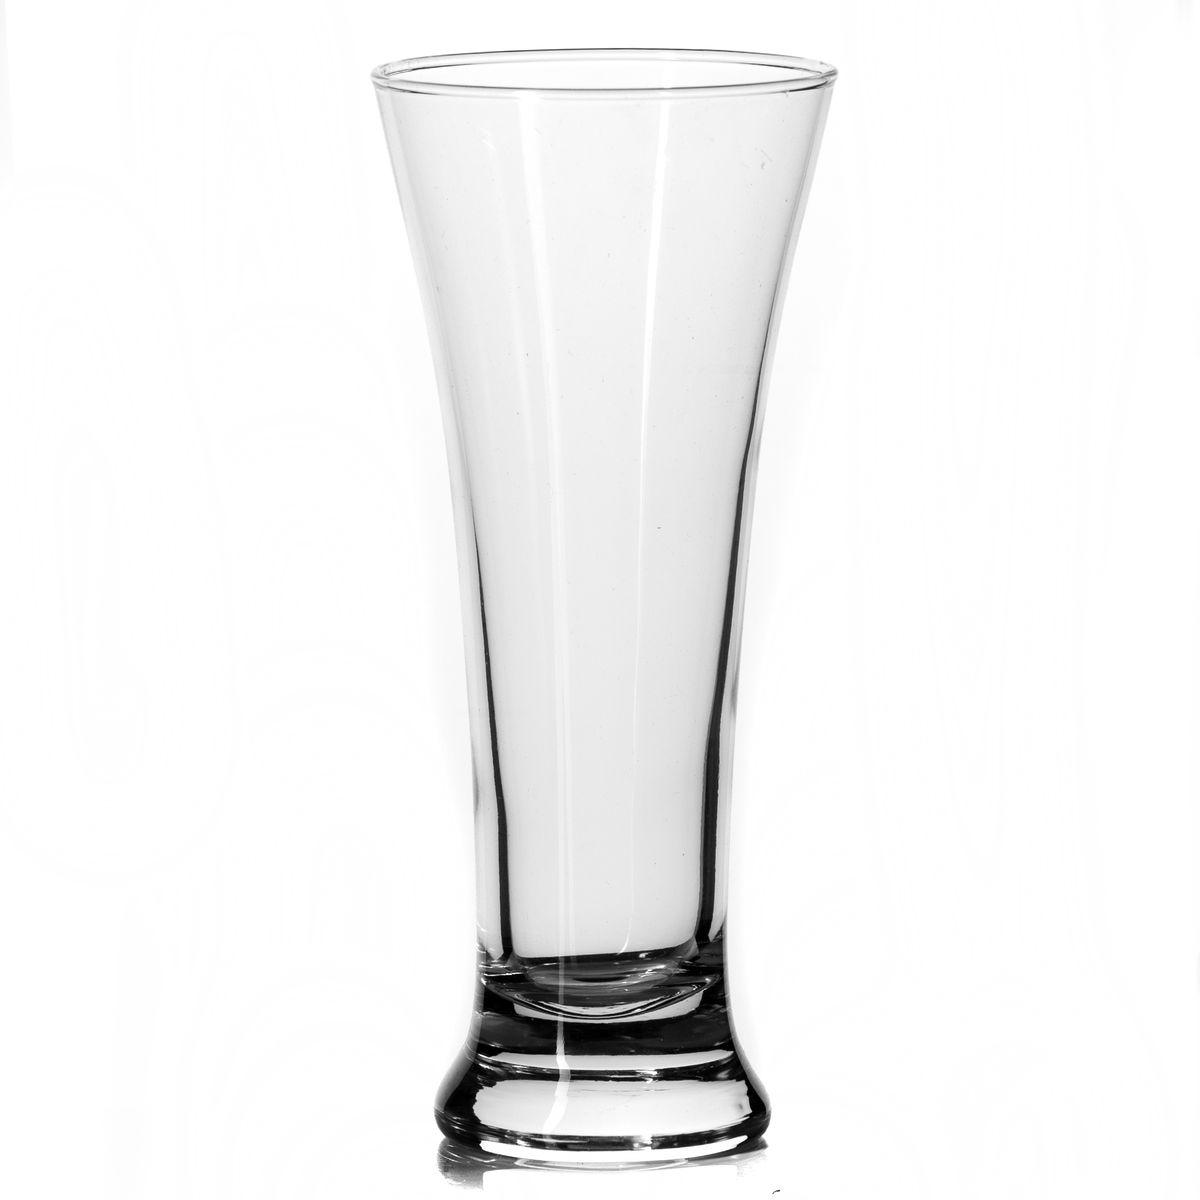 Набор бокалов для пива Pasabahce Pub, 300 мл, 3 шт набор бокалов для бренди коралл 40600 q8105 400 анжела